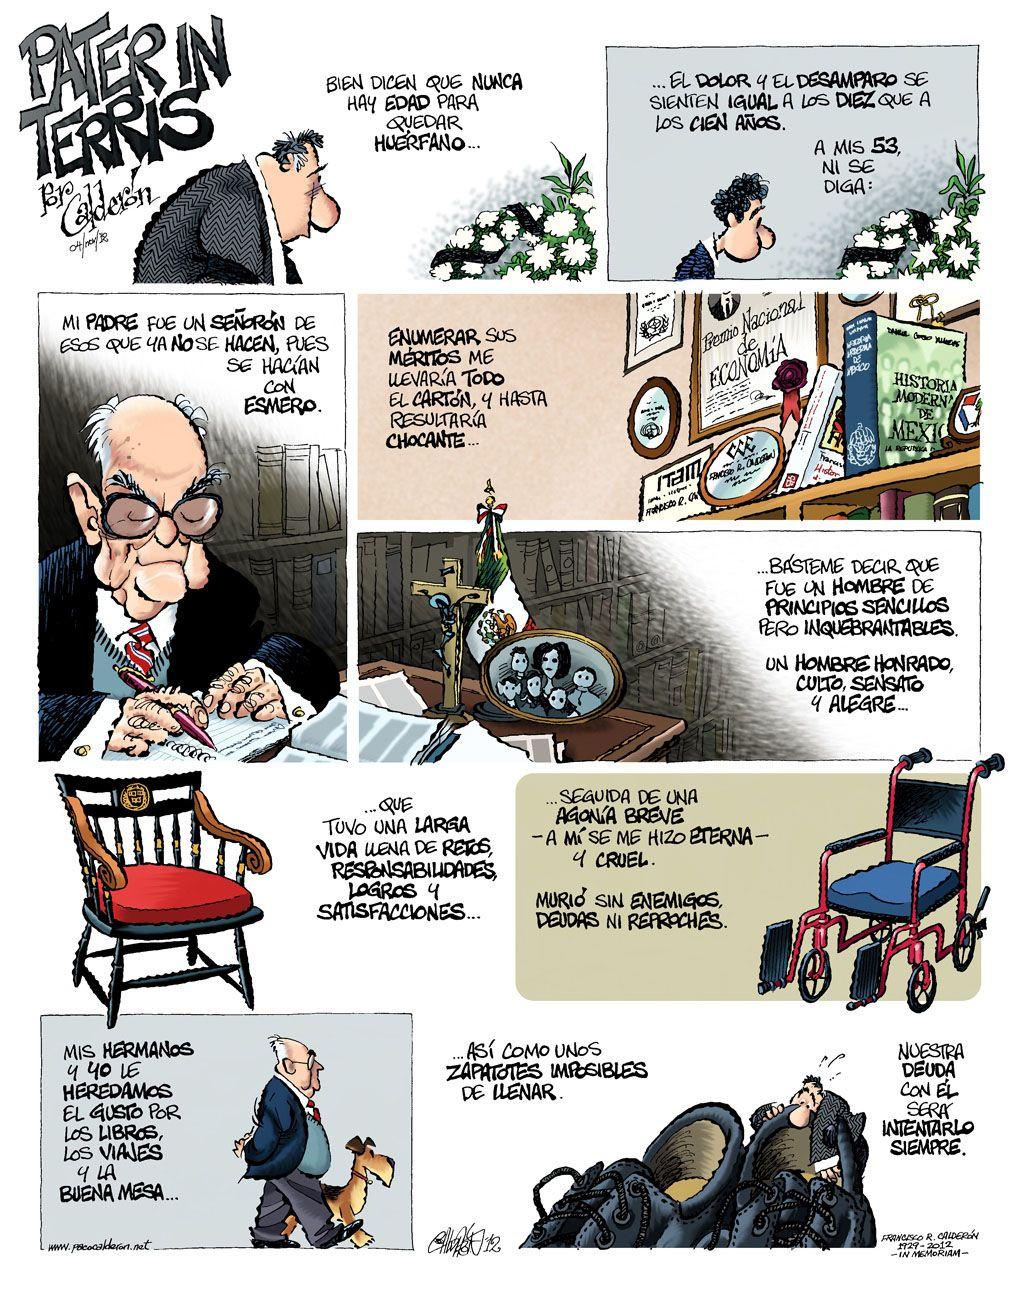 2012/11/04  PATER IN TERRIS por Paco Calderón (Un abrazo)